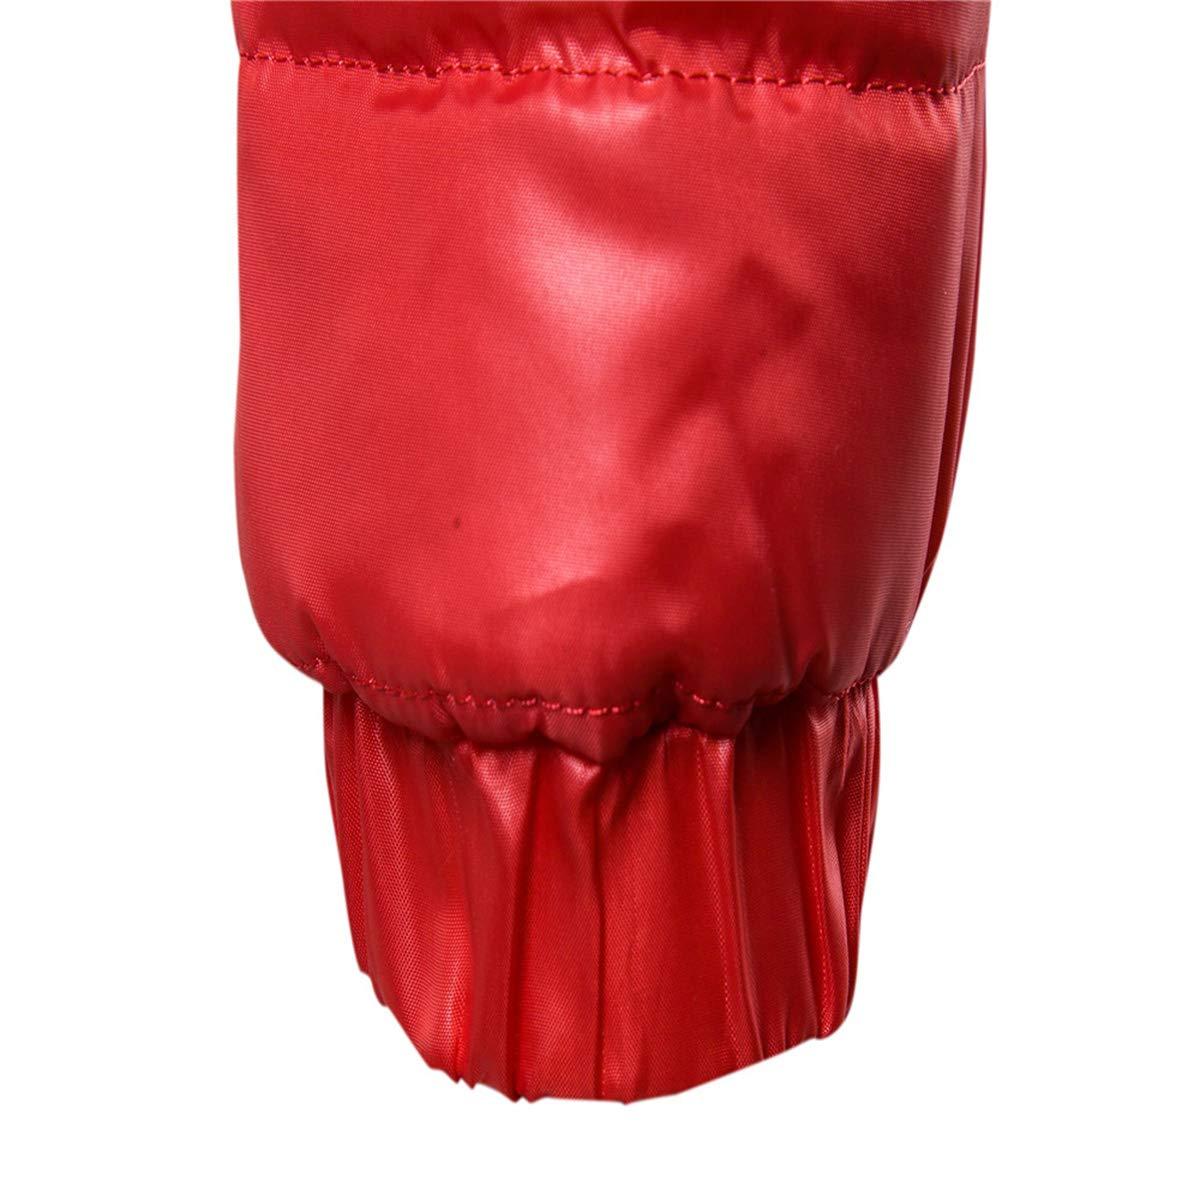 Hombre Chaqueta de oto/ño Invierno Chaquetas de Pluma Hombres Stand Collat Ultra Ligero C/álido Outwear Abrigo Parkas al Aire Libre